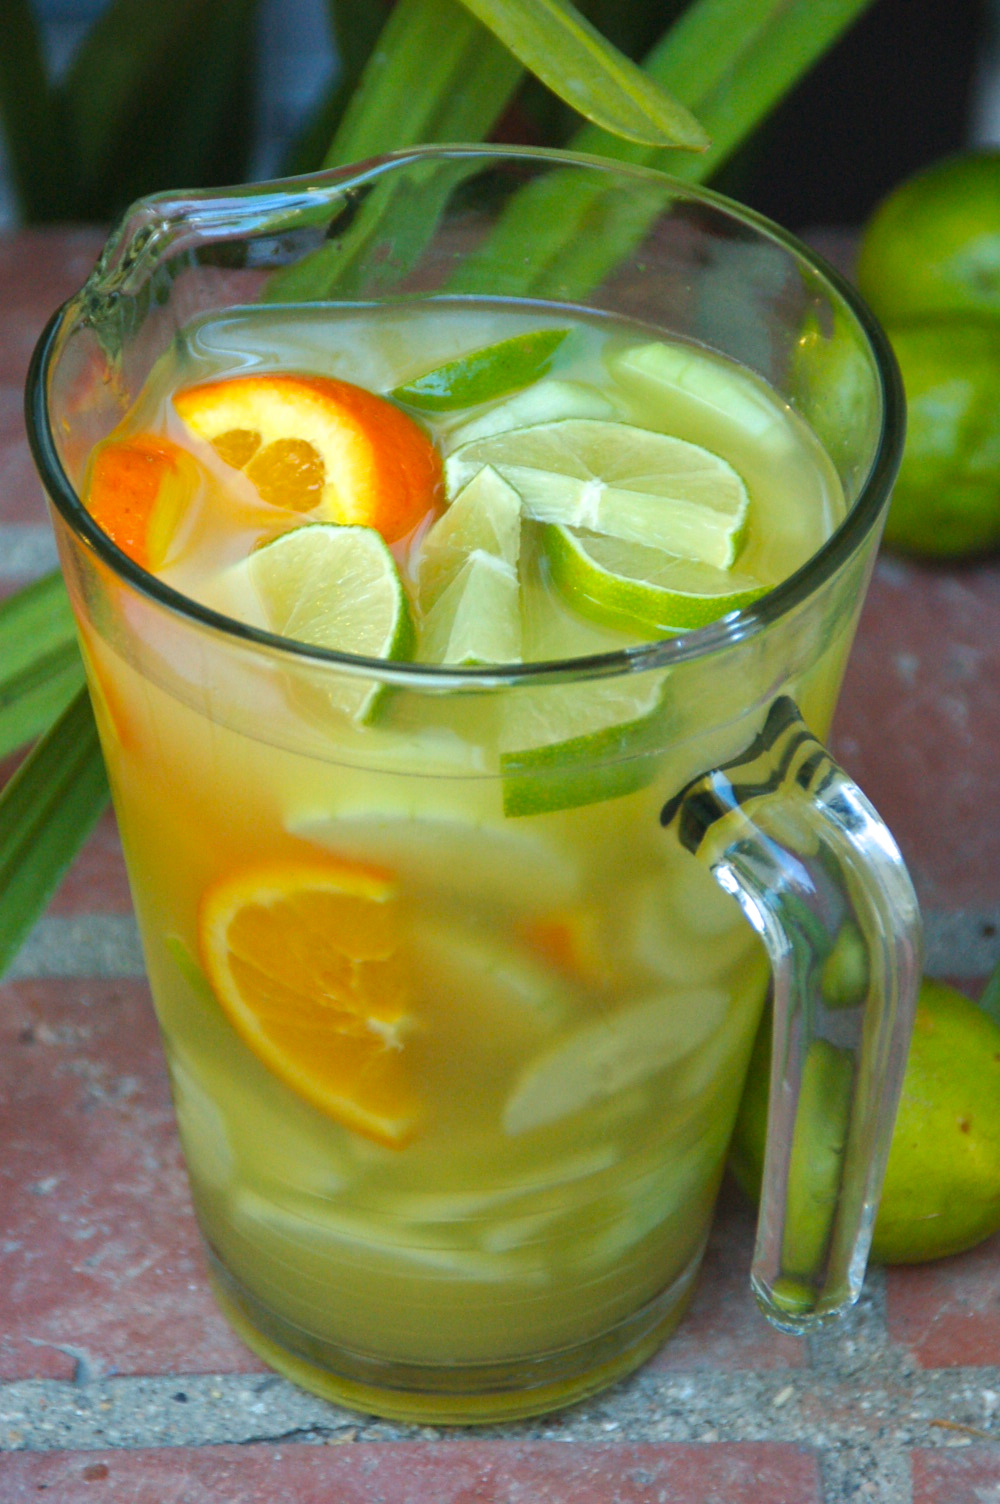 Cucumber lime orange